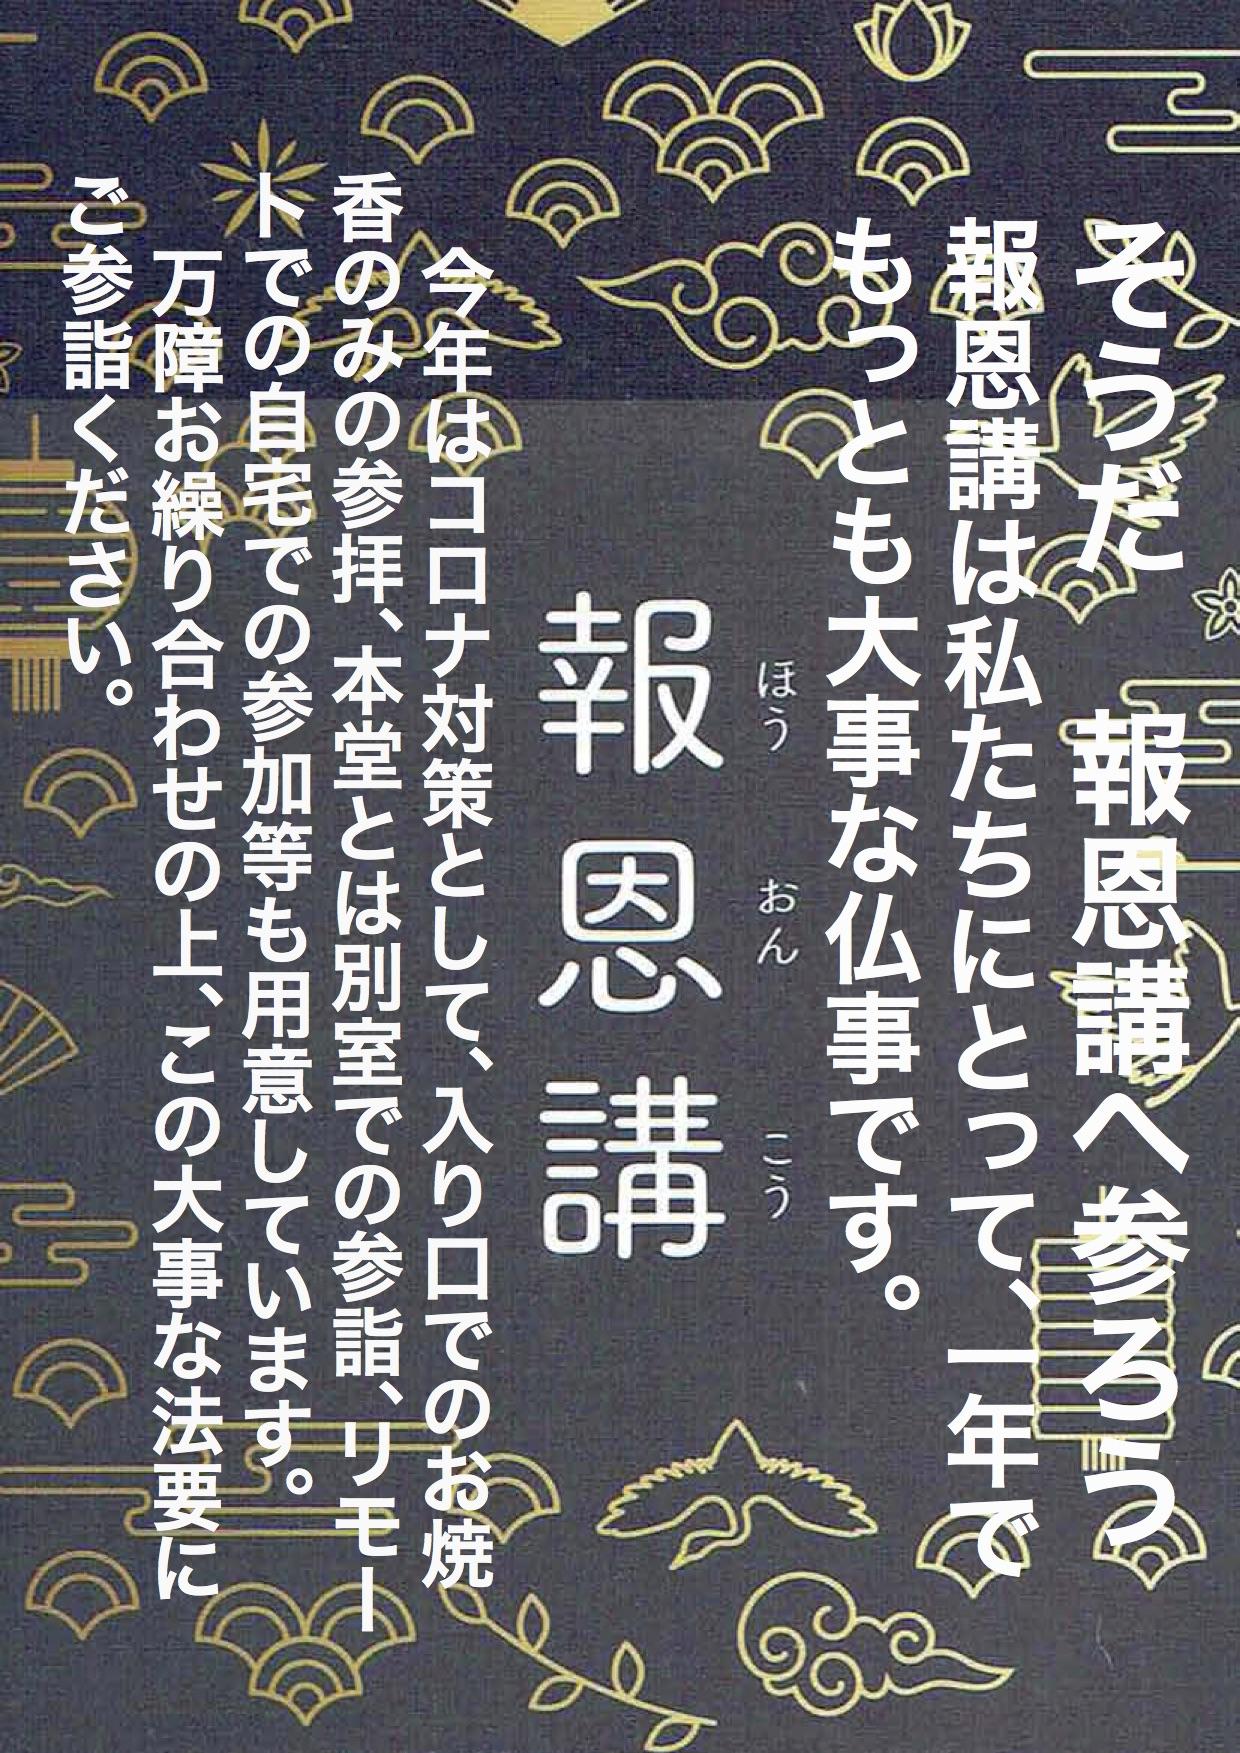 ryoganji_keiji2.jpg